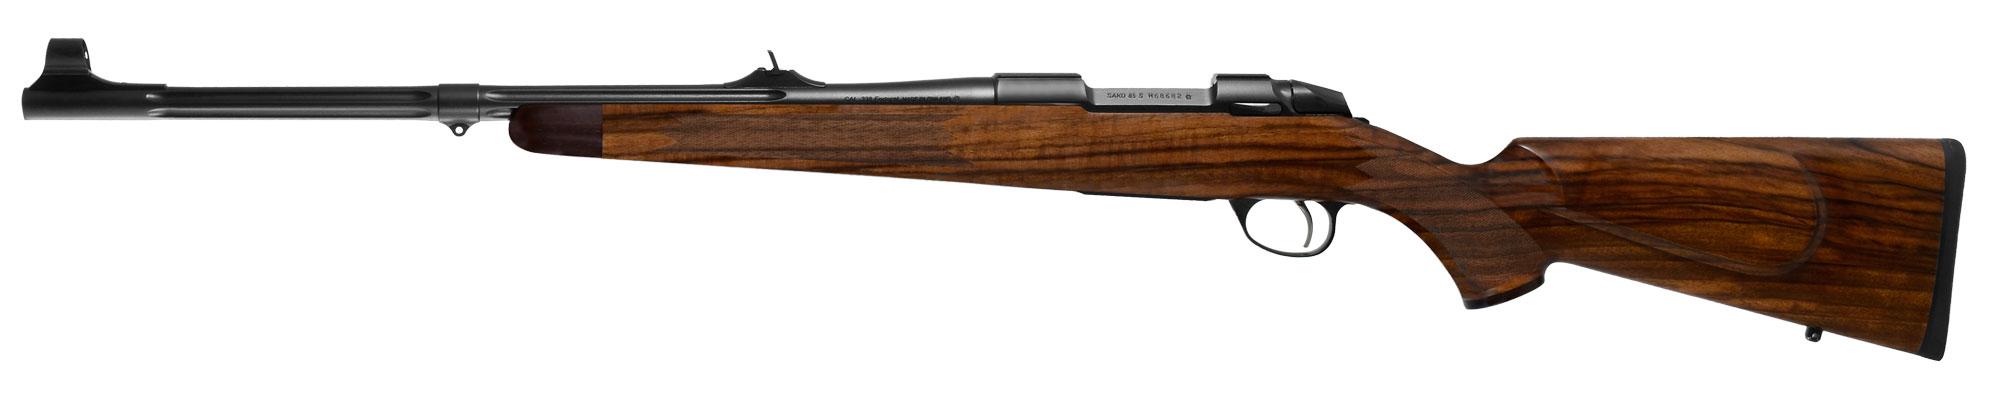 Sako Grizzly .338 Federal Rifle JRS3A43